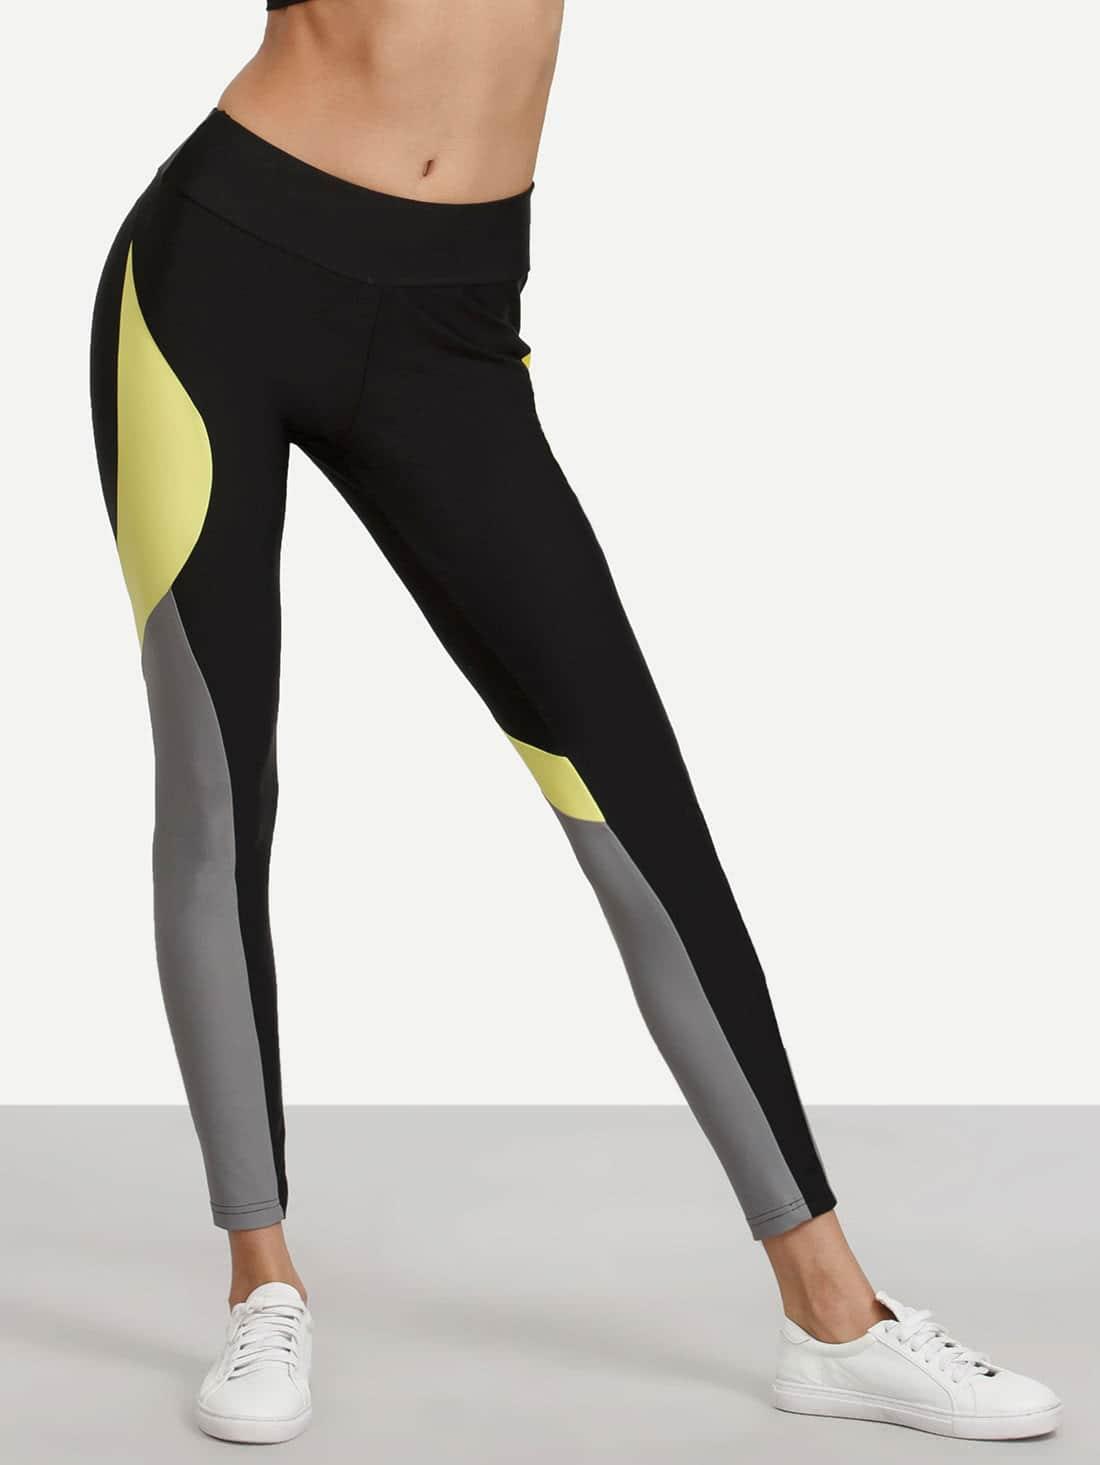 Colorblock Stretchy Skinny Leggings